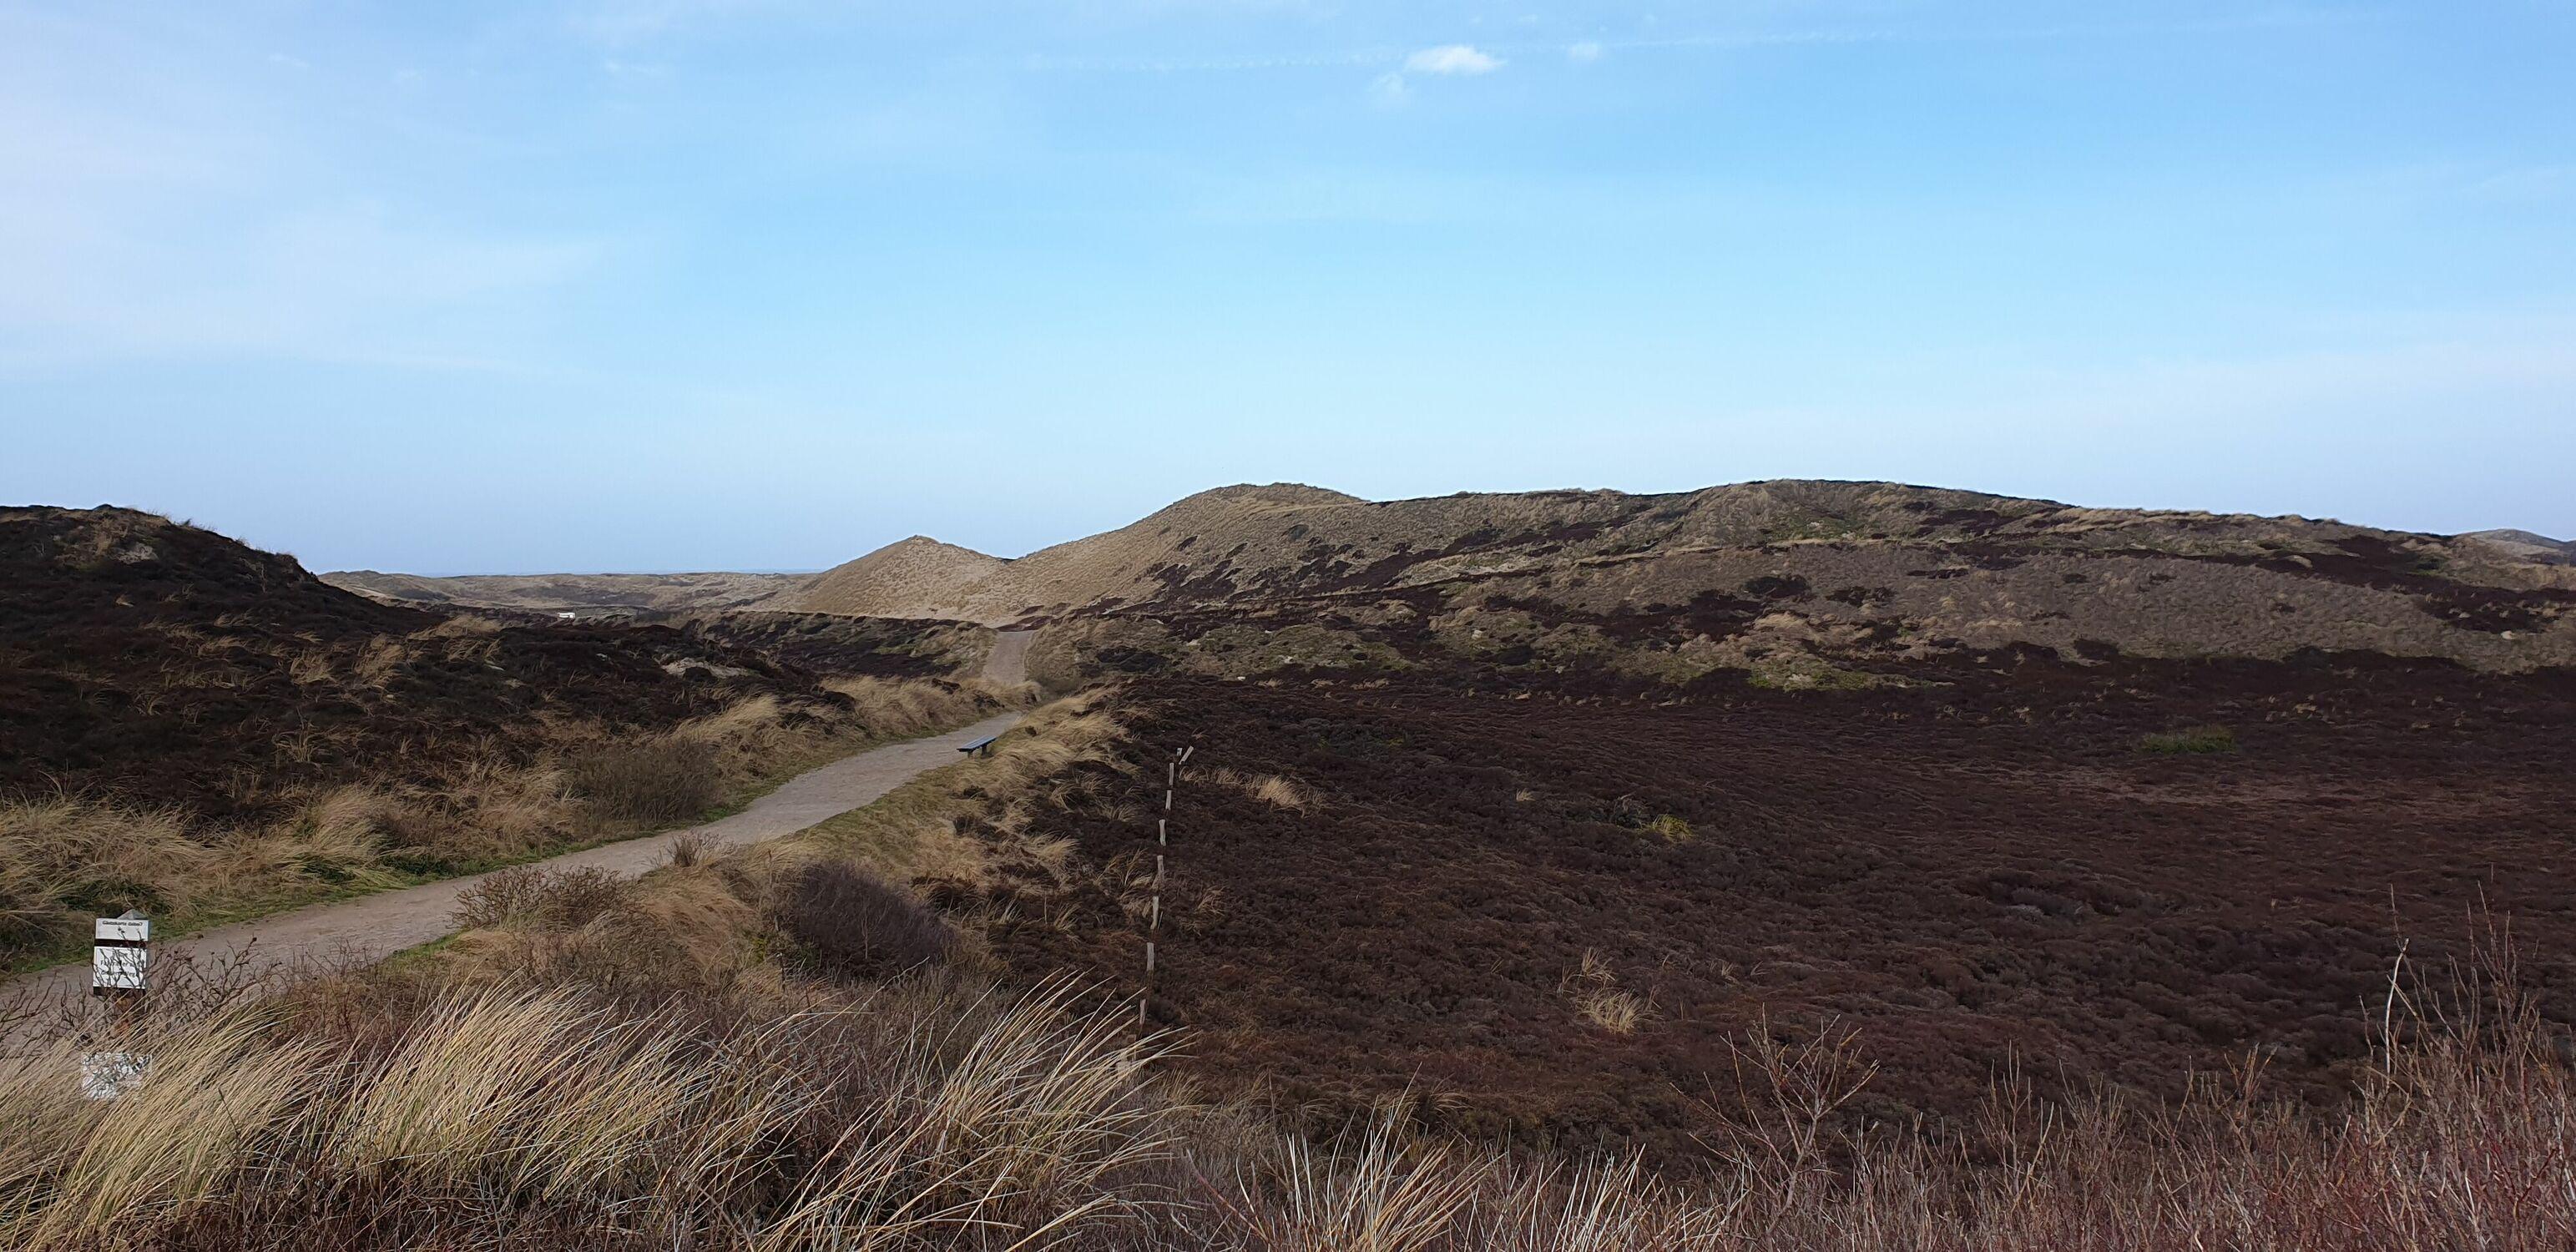 Bild mit Dünengras, Sylt, Dünenlandschaft, Dünenschilf, Dünen panorama, Dünenblick, Sanddünen